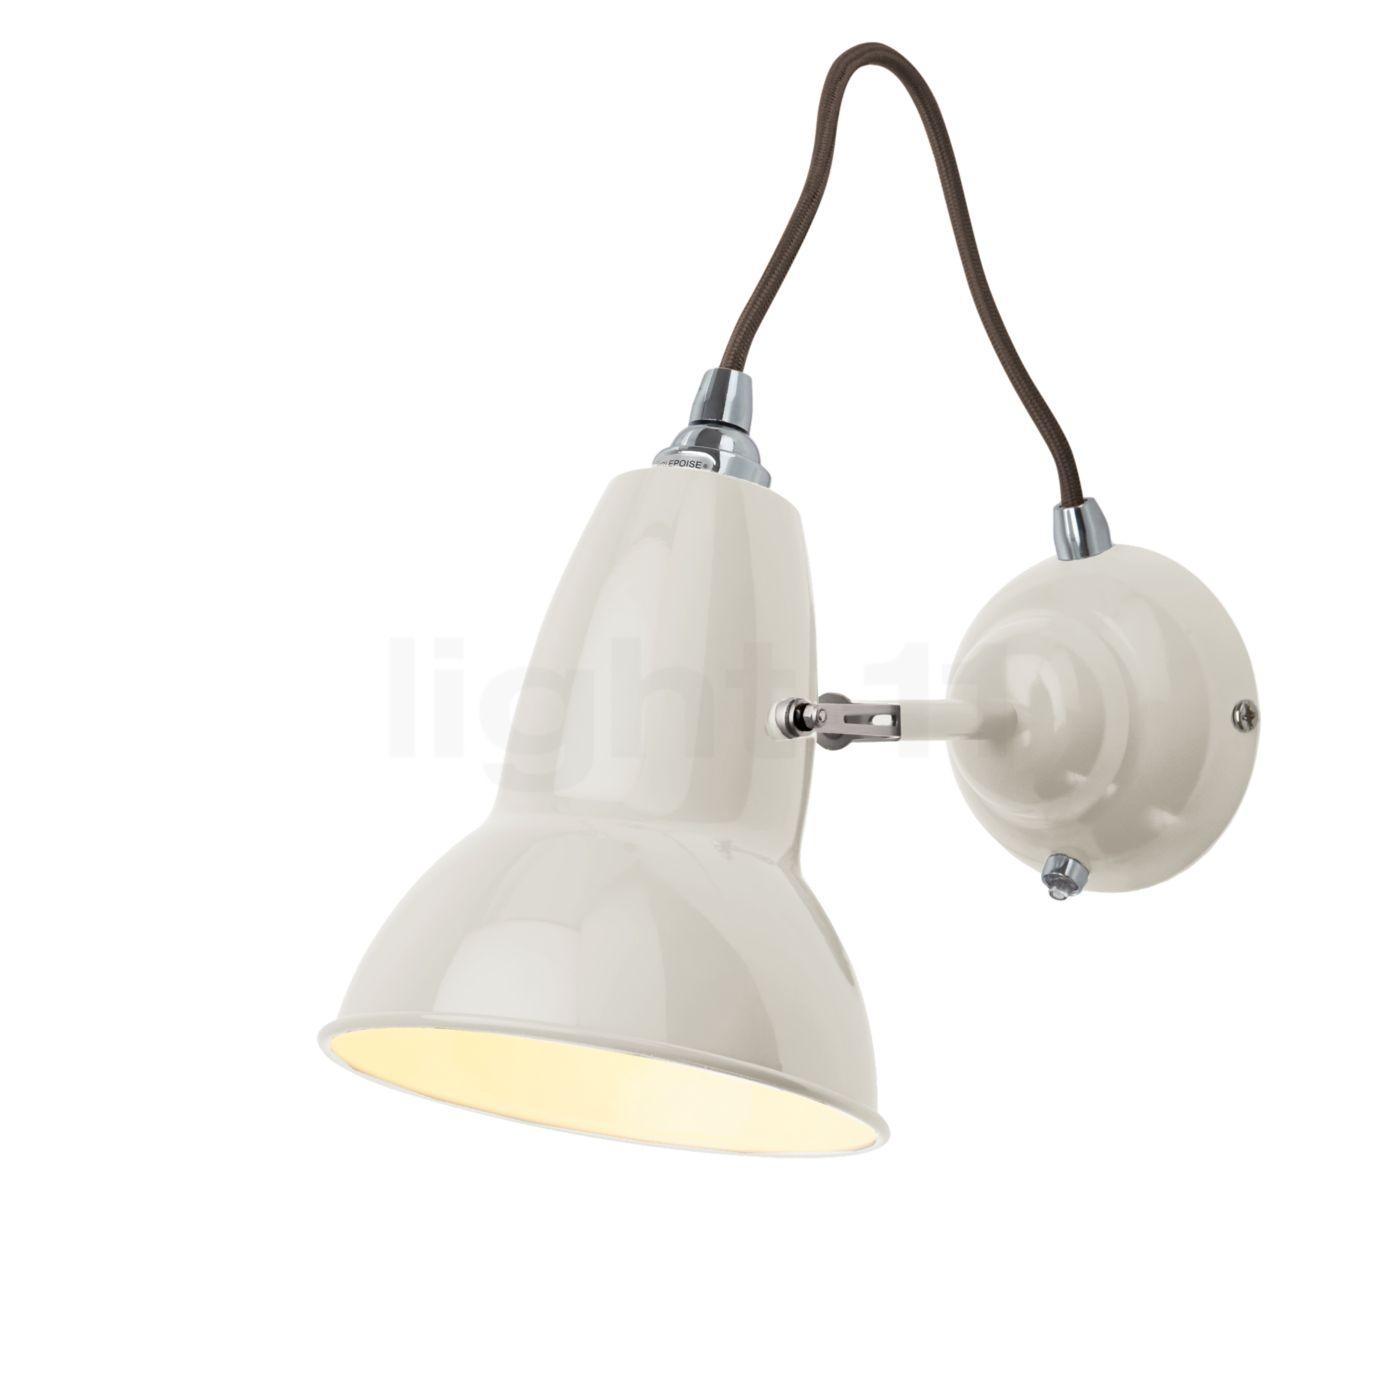 Anglepoise_Original_1227_Wandleuchte--b8052d90f7725d6e11d6978aff64885c Faszinierend Wandlampe Mit Kabel Und Stecker Dekorationen